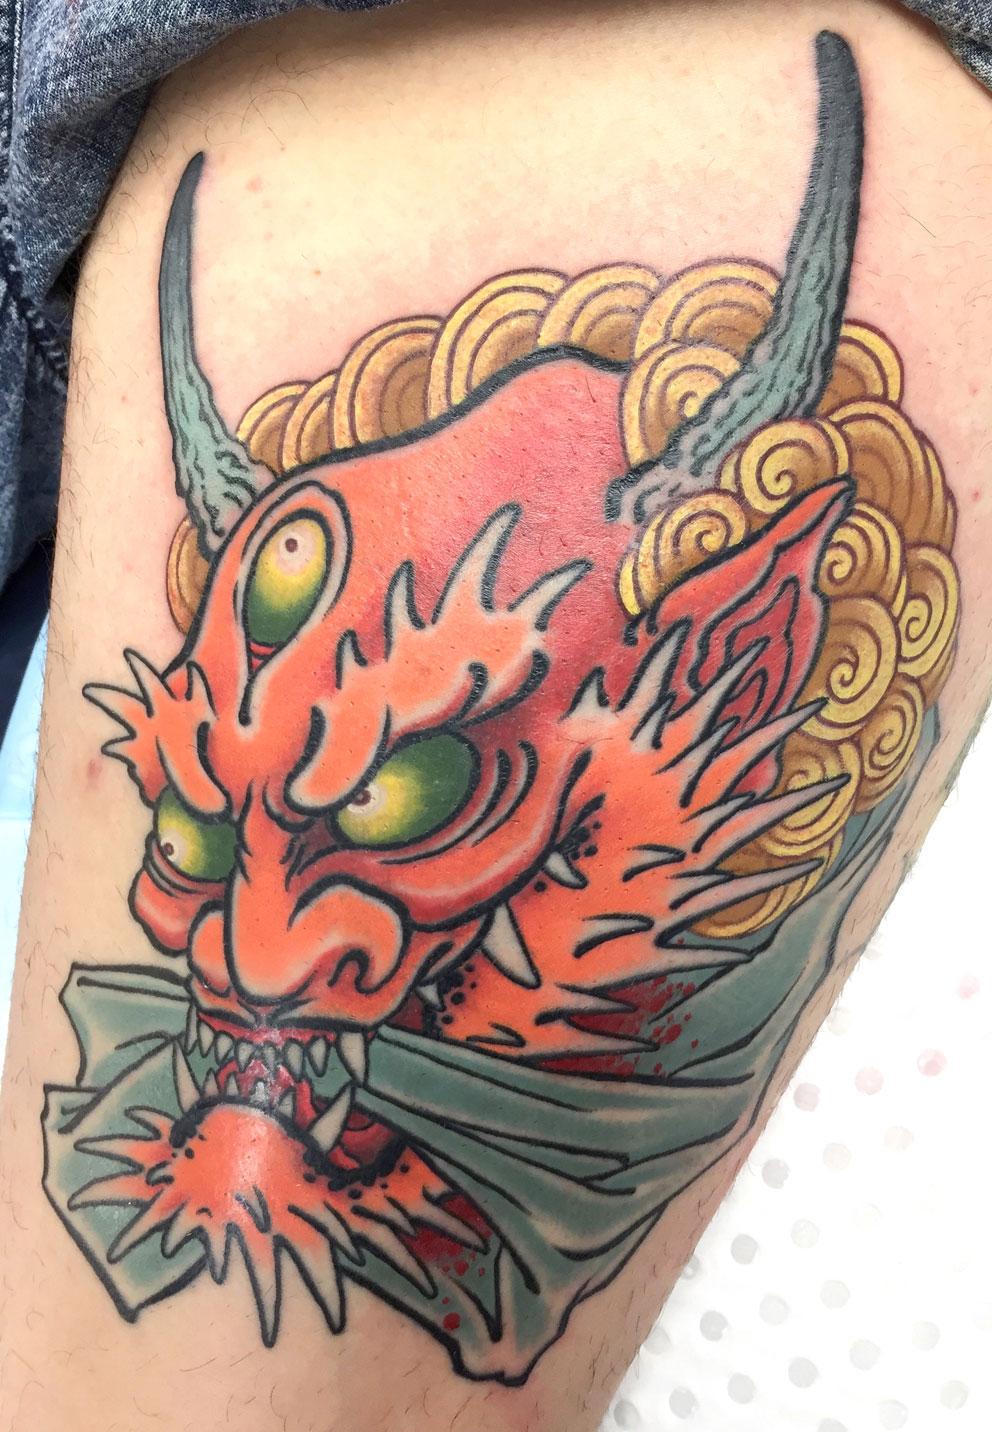 Alex Rusty - Oni namakubi japanese tattoo